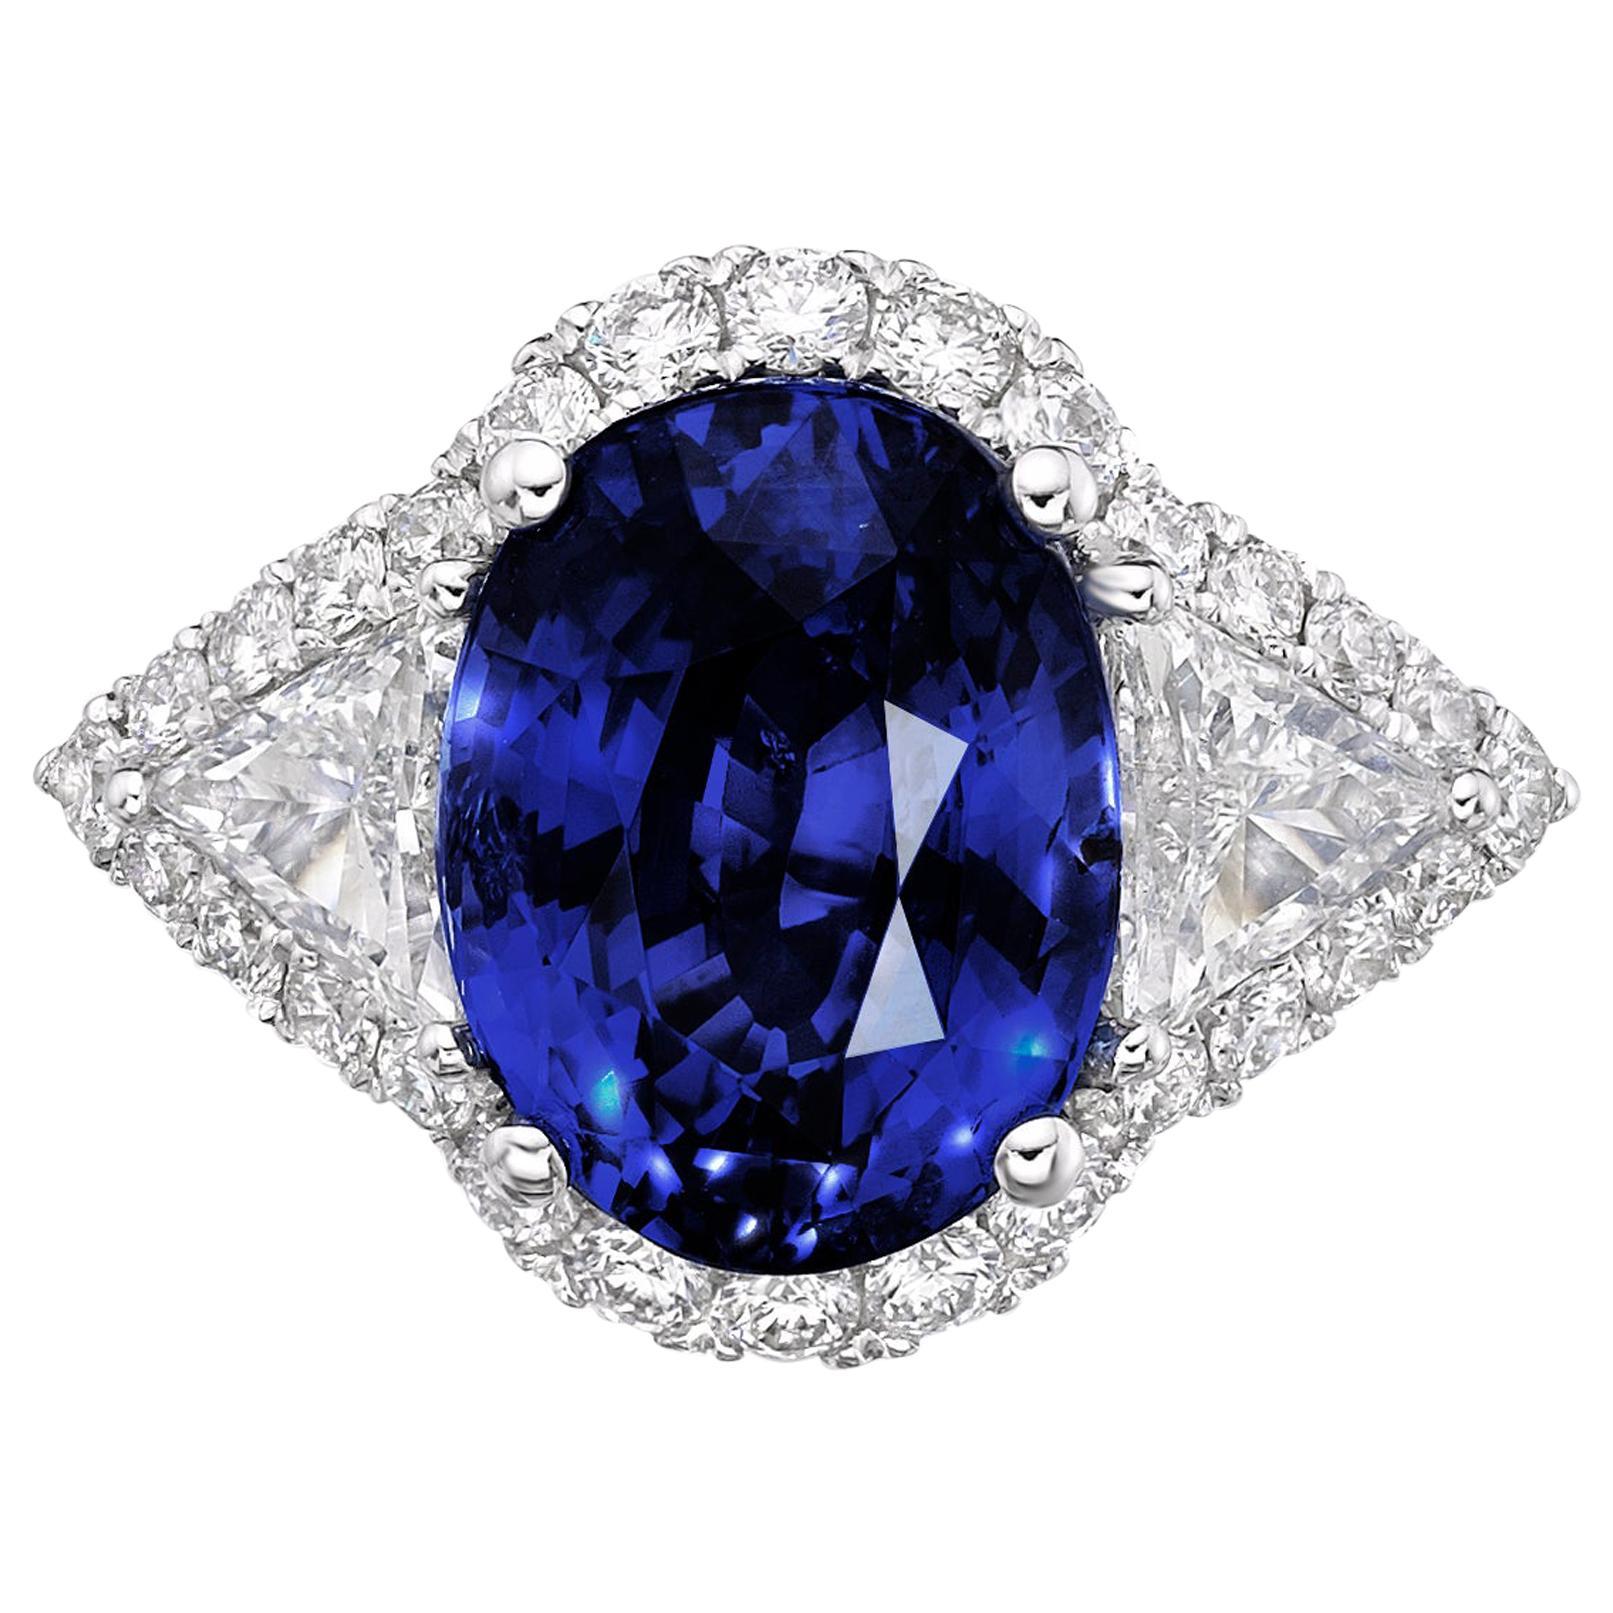 6.97 Carat Royal Blue Sapphire GRS Certified Unheated Diamond Ceylon Ring Oval